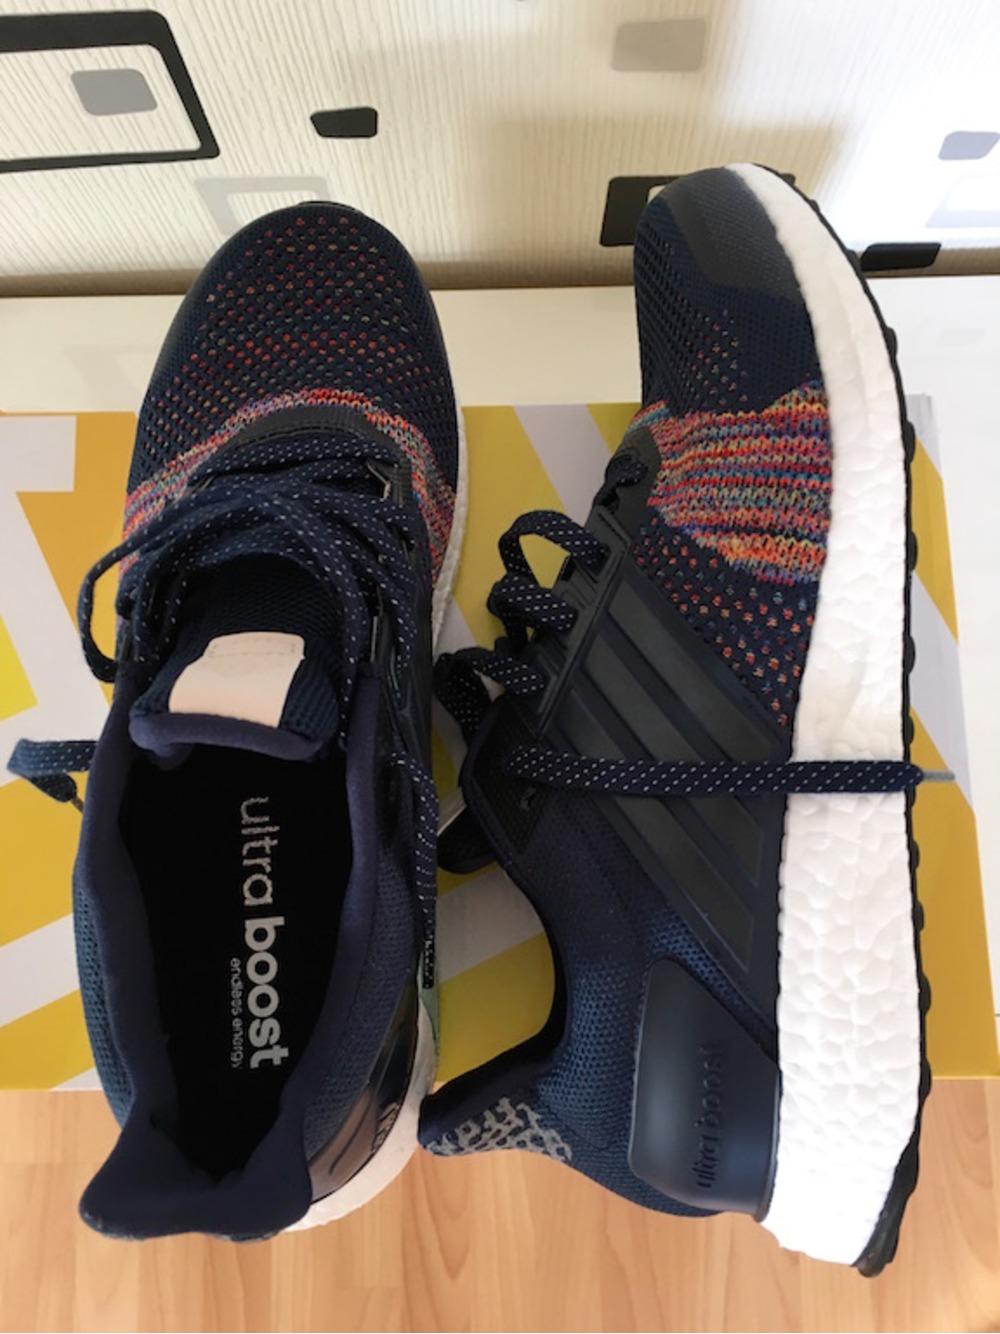 1229cd3aa1e6d ... Adidas ultra boost street ltd multicolor nmd yeezy y3 zx flux 90 1 air  max 42